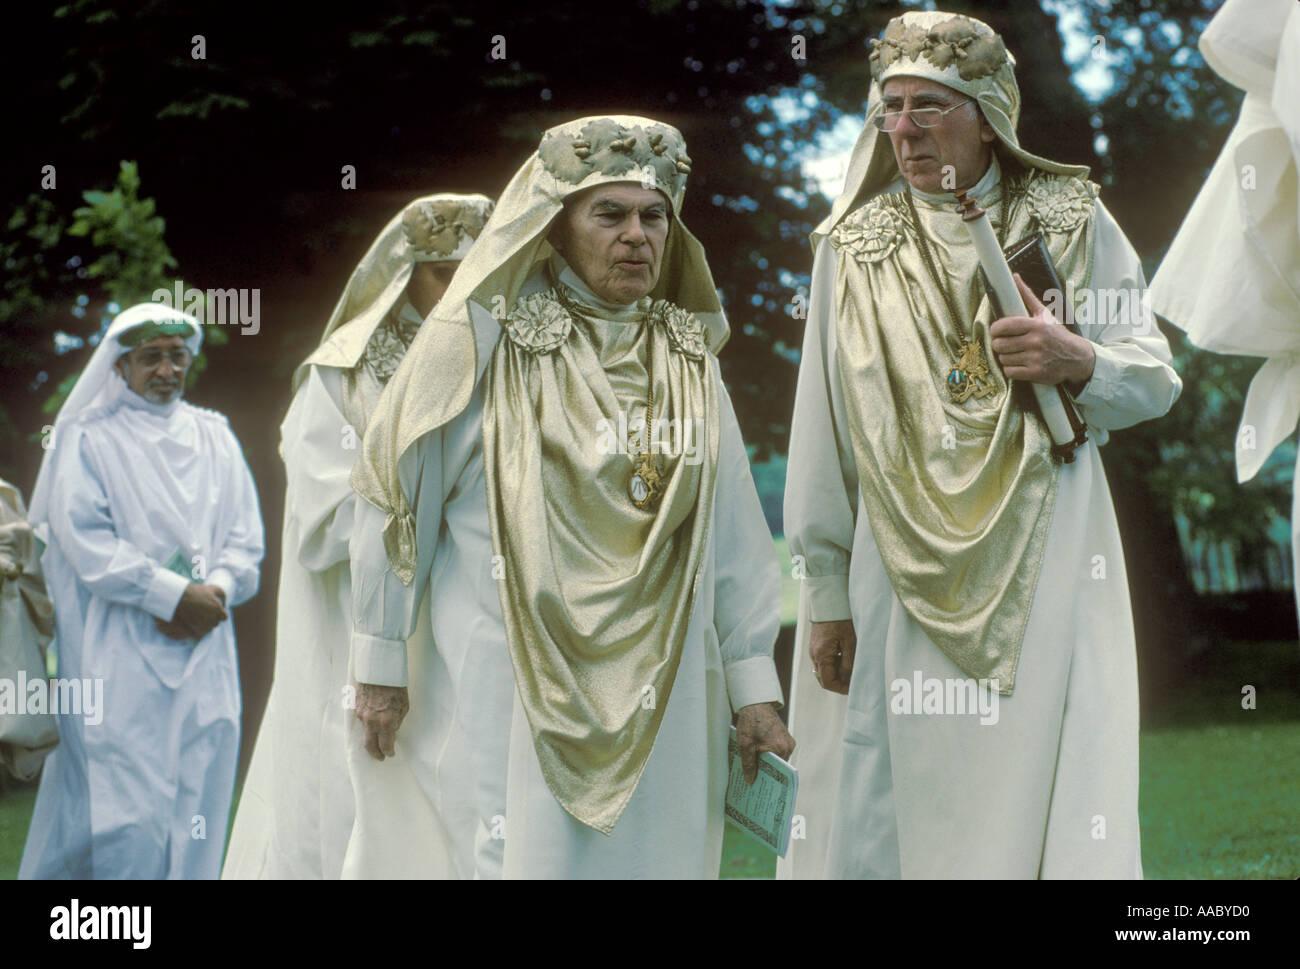 The Gorsedd of Bards of the Isle of Britain Bala Gwynedd Wales HOMER SYKES - Stock Image